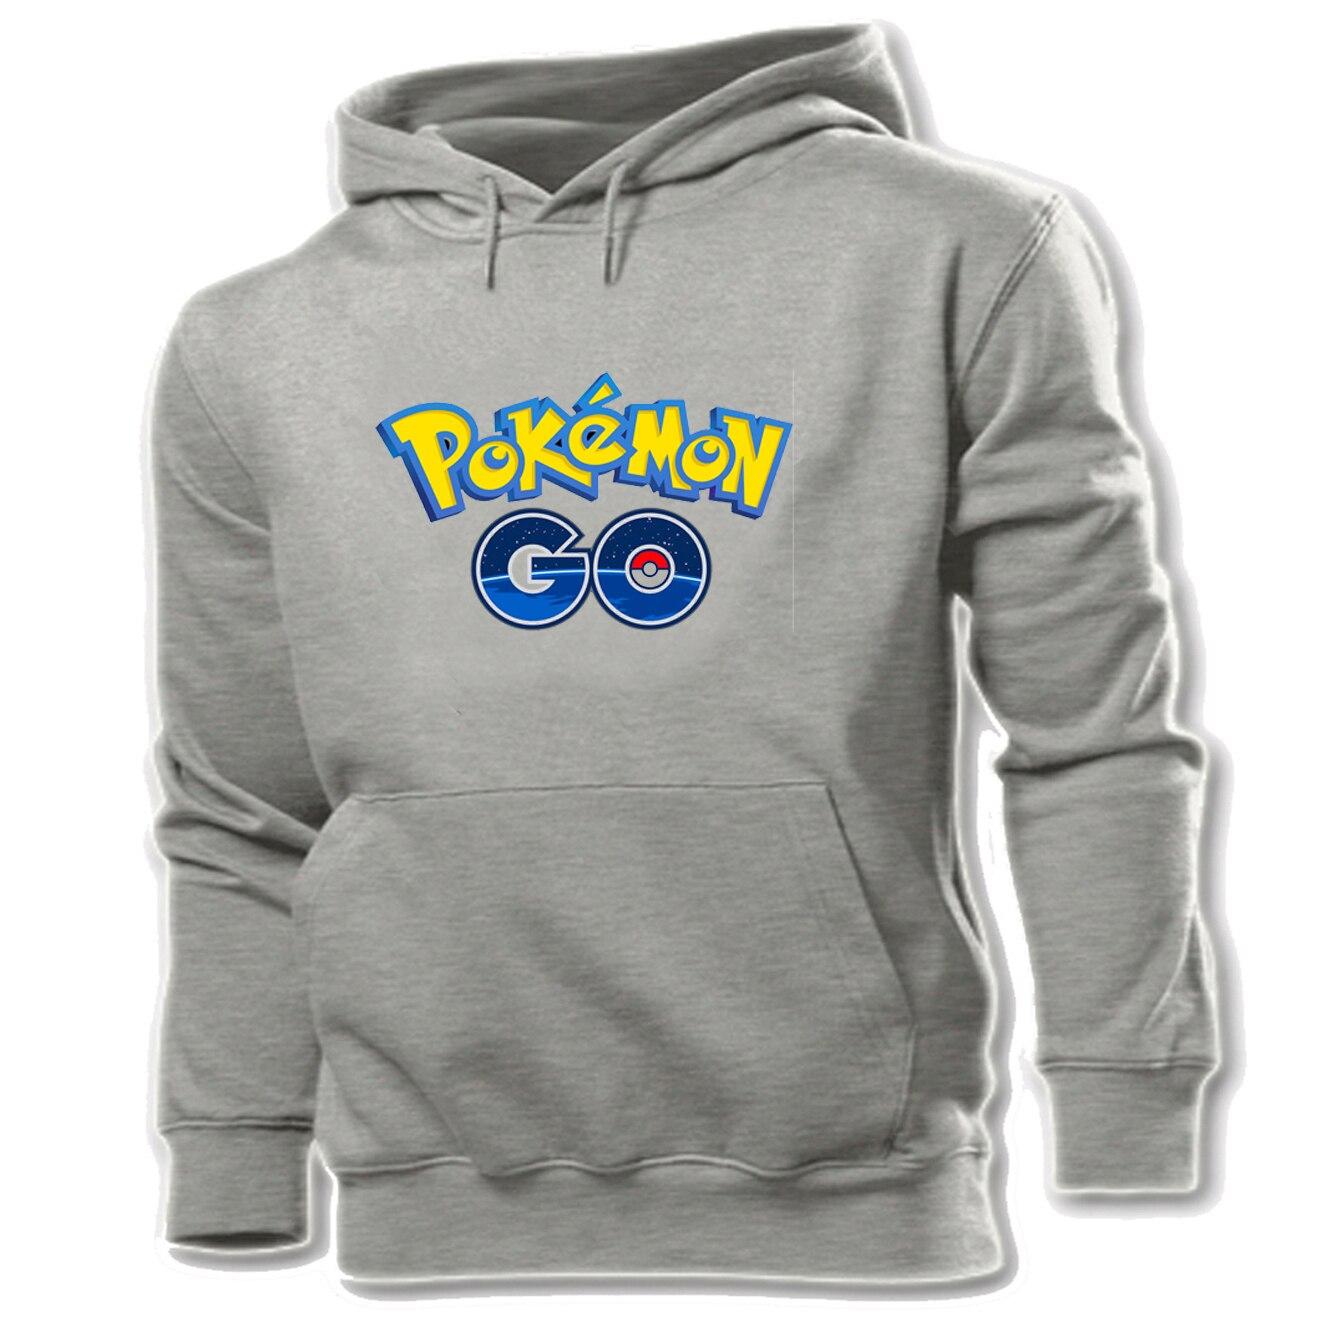 unisex-men's-women's-boy's-girl's-cute-font-b-pokemon-b-font-go-gamemoltres-articuno-zapdos-design-sweatshirt-hoodie-plain-hoody-jackets